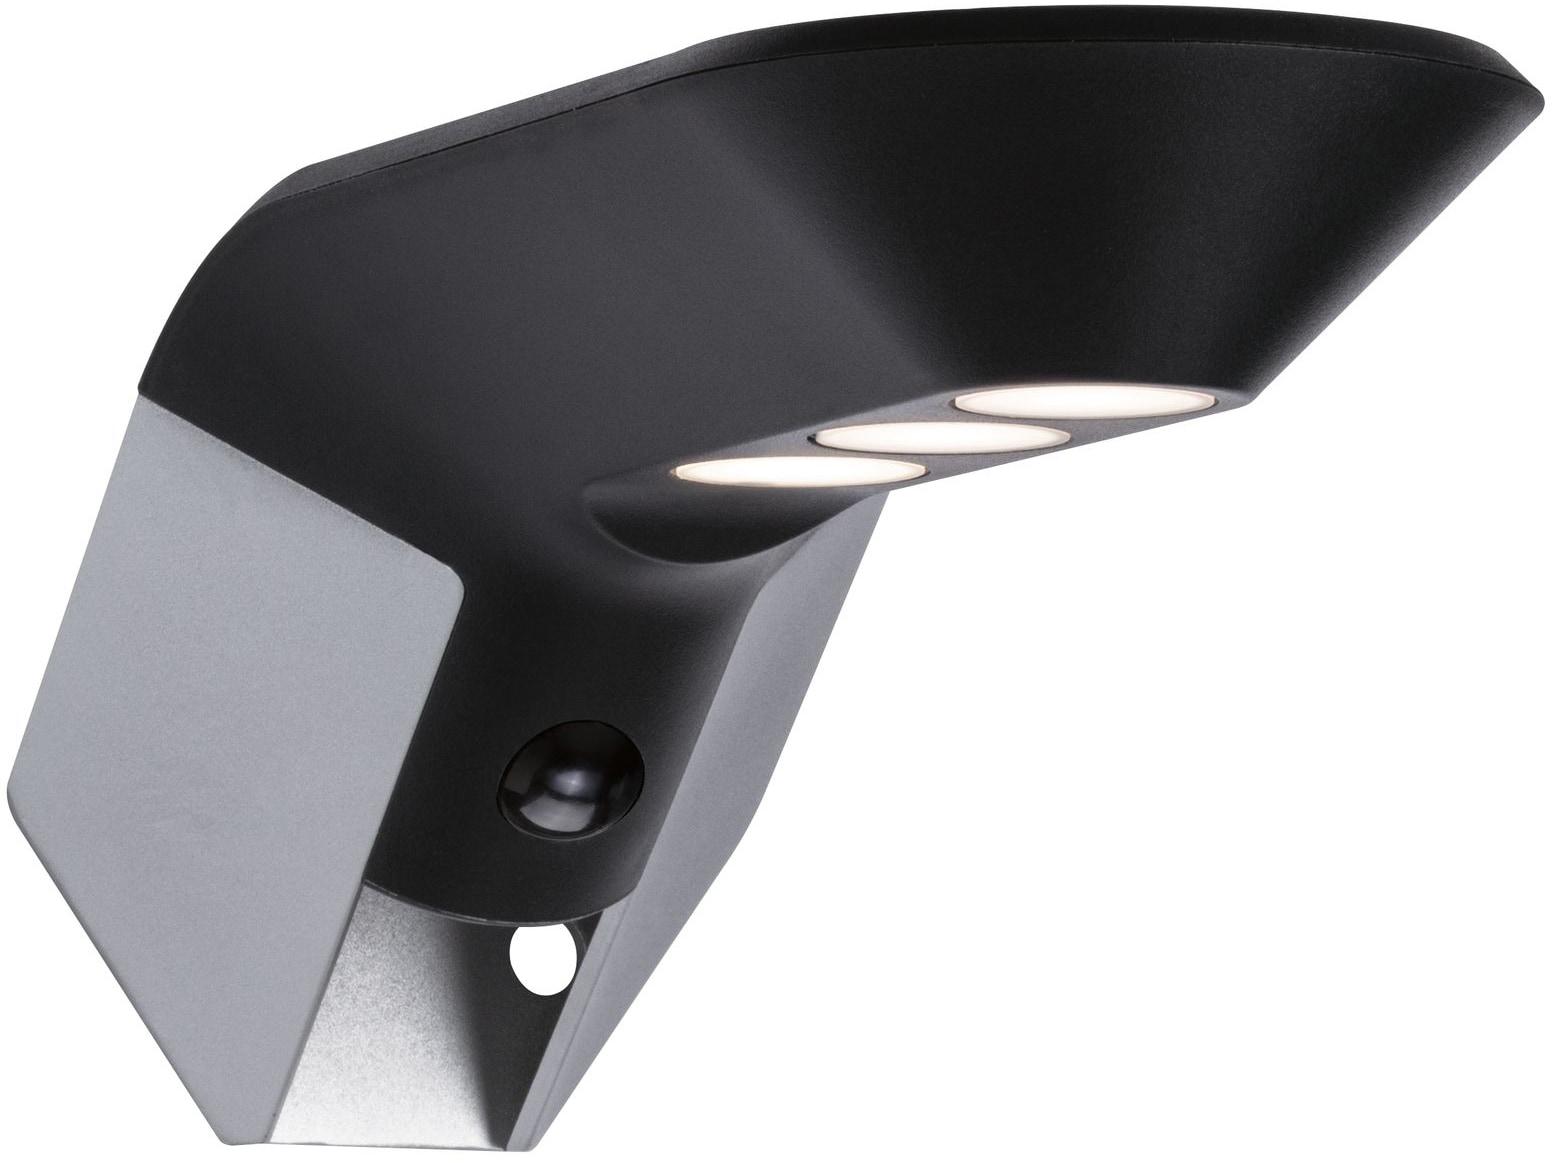 Paulmann LED Außen-Wandleuchte Soley, LED-Board, 1 St., Warmweiß, Solar ZigBee